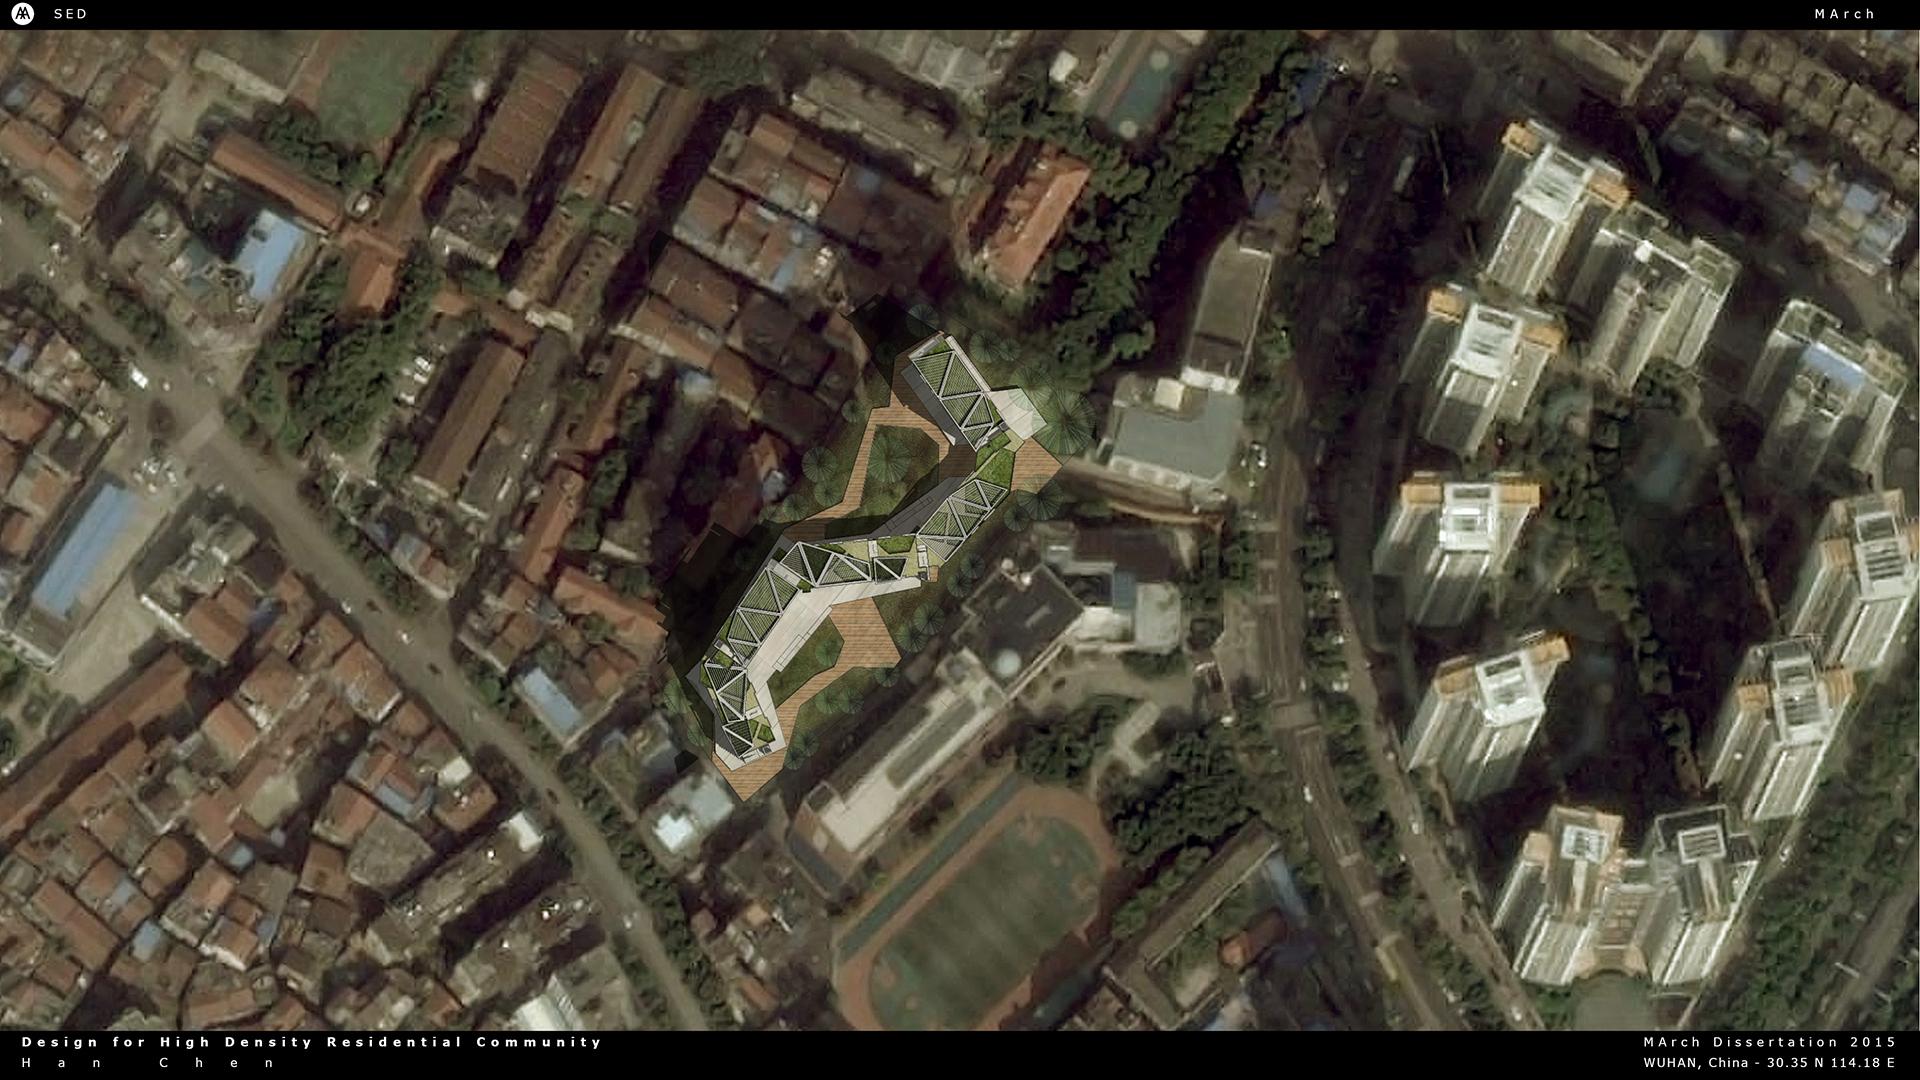 Wuhan, China-26R.jpg